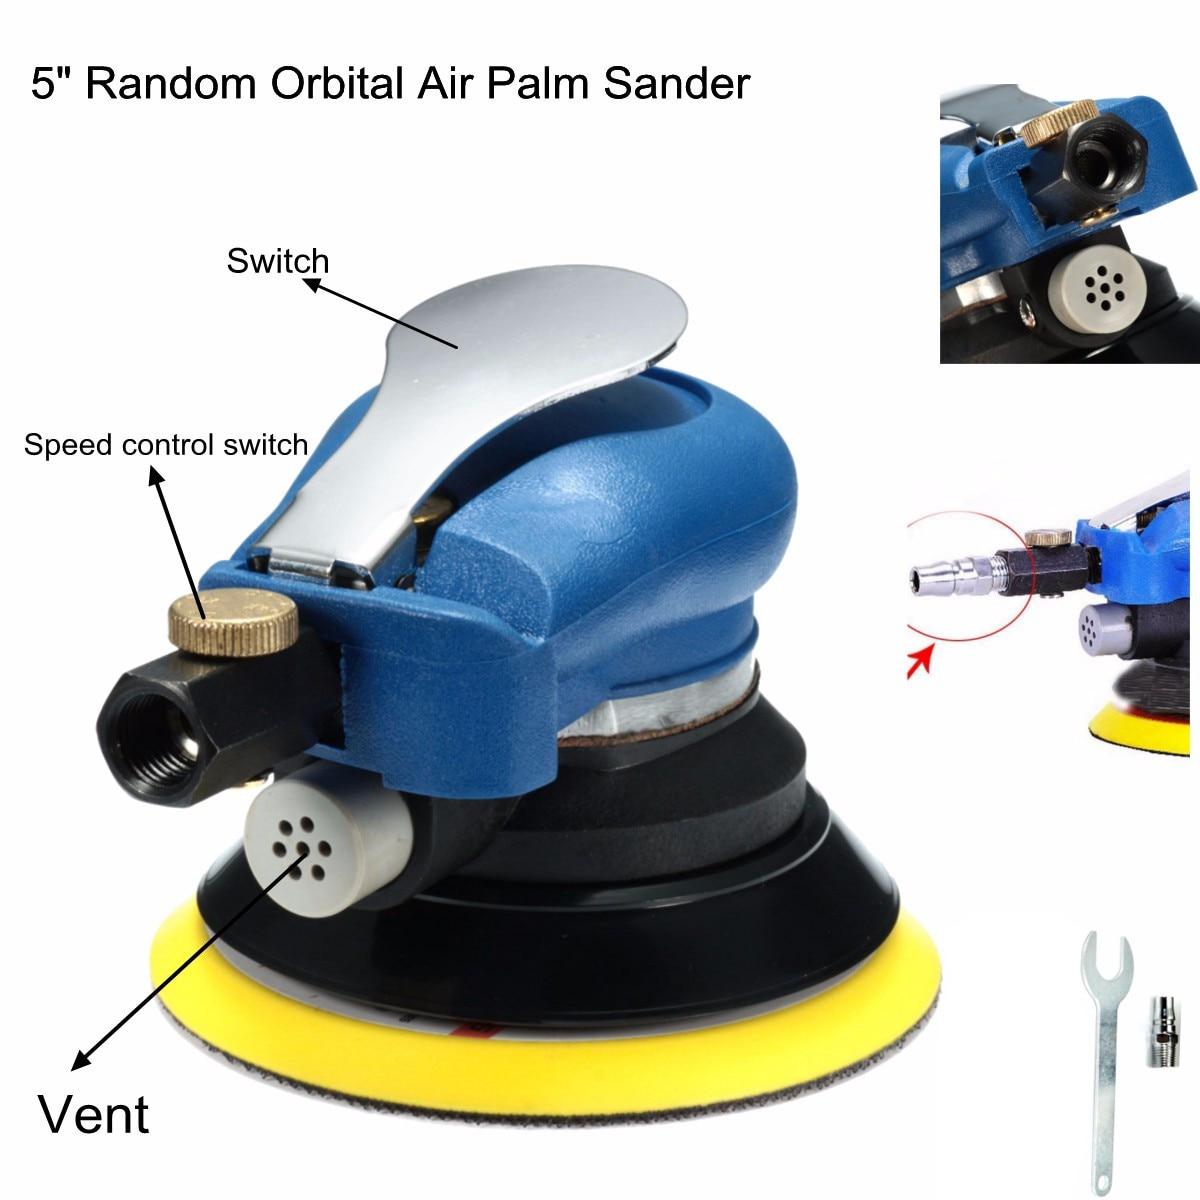 5inch 9000rpm Air Orbital Sander Random Hand Sanding Pneumatic Round for Automotive Sheet Metal Putty Grinding orbital brighton